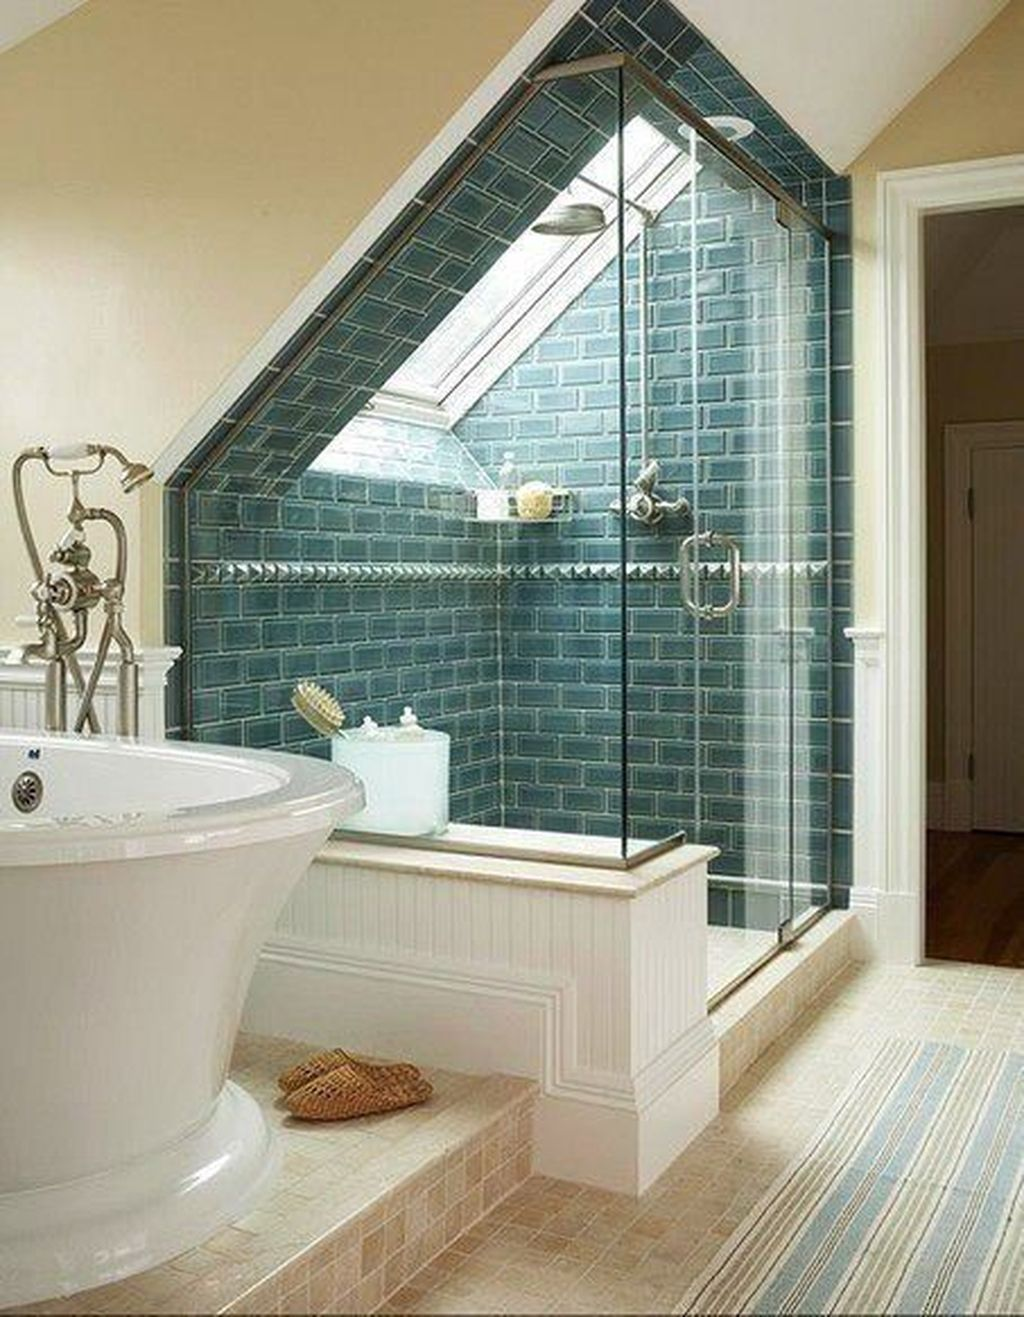 Best 60 Attic Master Bedroom Inspiration 10 Home 400 x 300